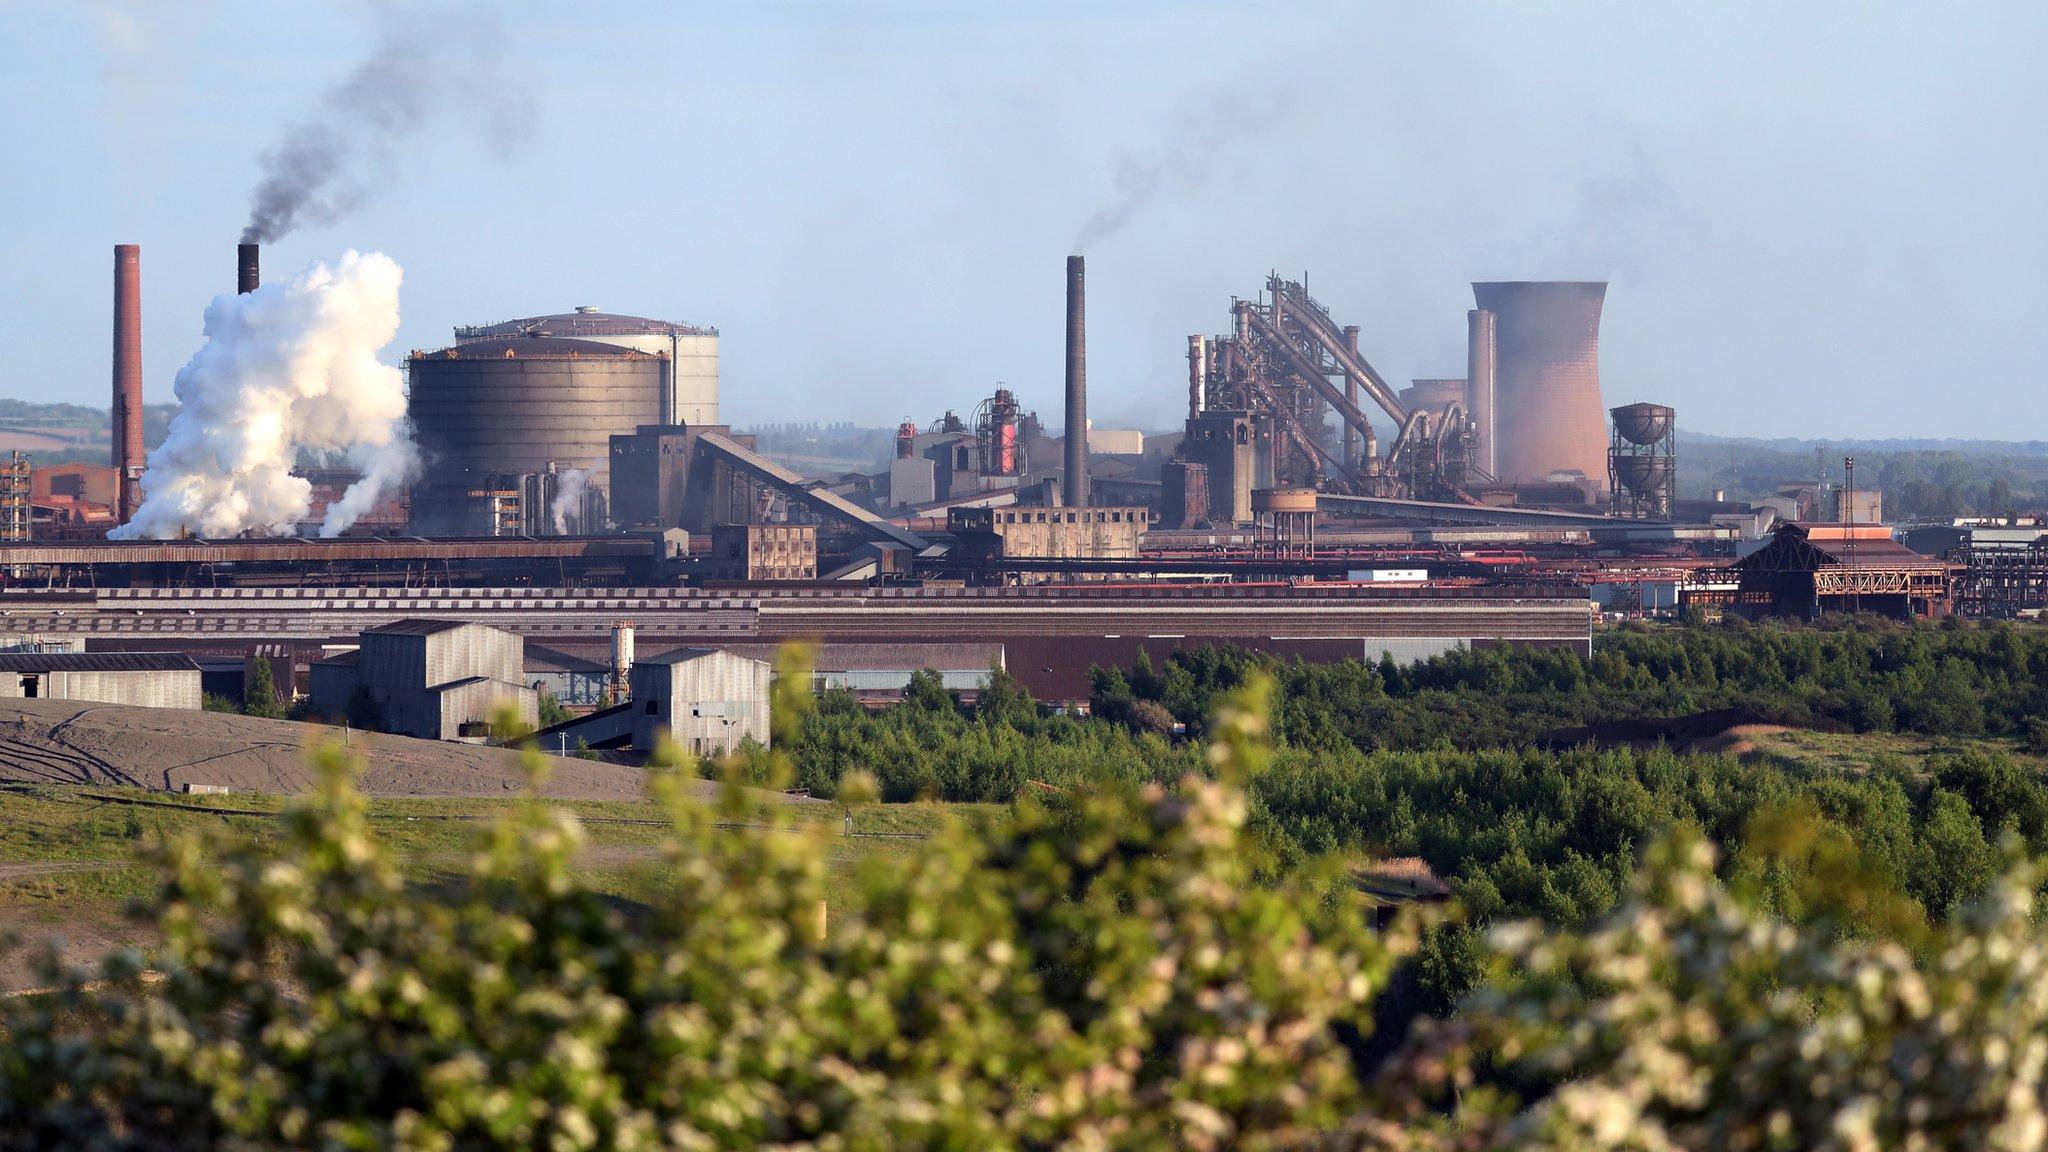 British Steel insolvency endangers 5,000 jobs